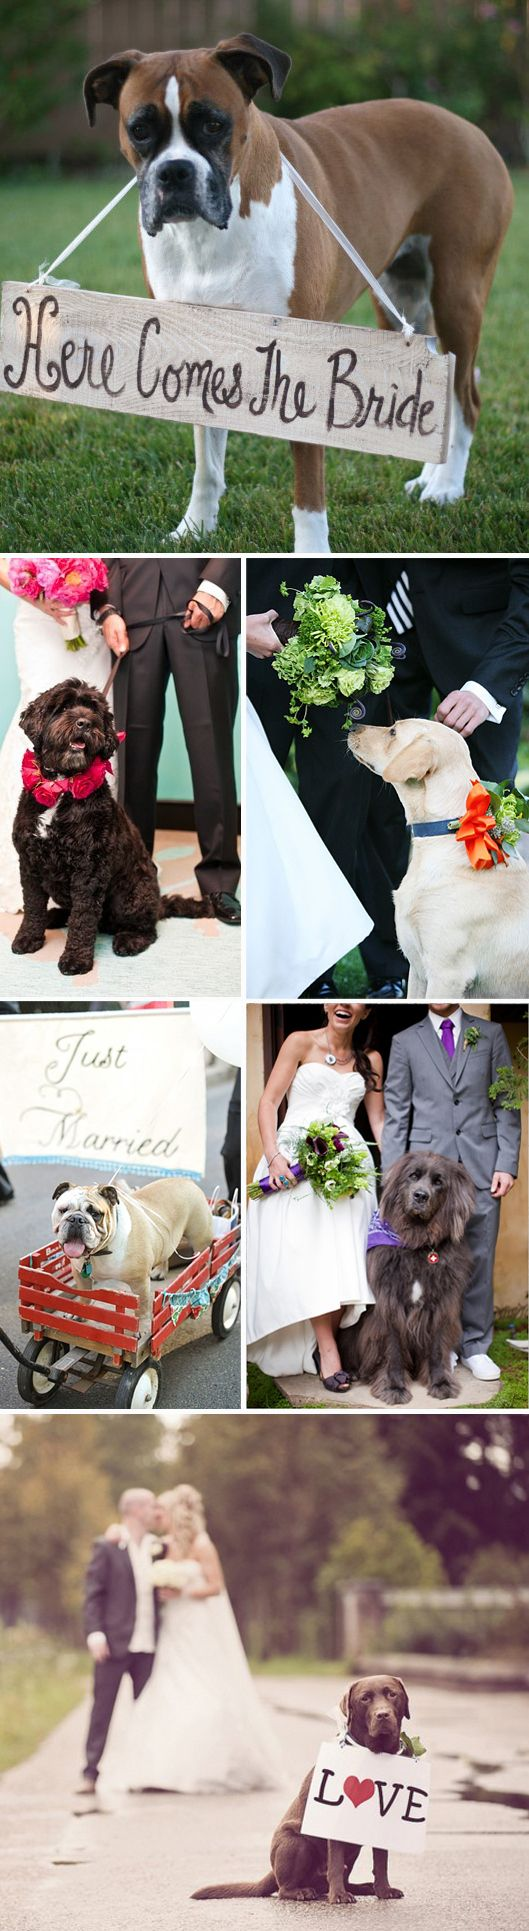 Exclusively Weddings Blog Wedding Planning Tips And More Dream Wedding Wedding Pets Wedding Photos